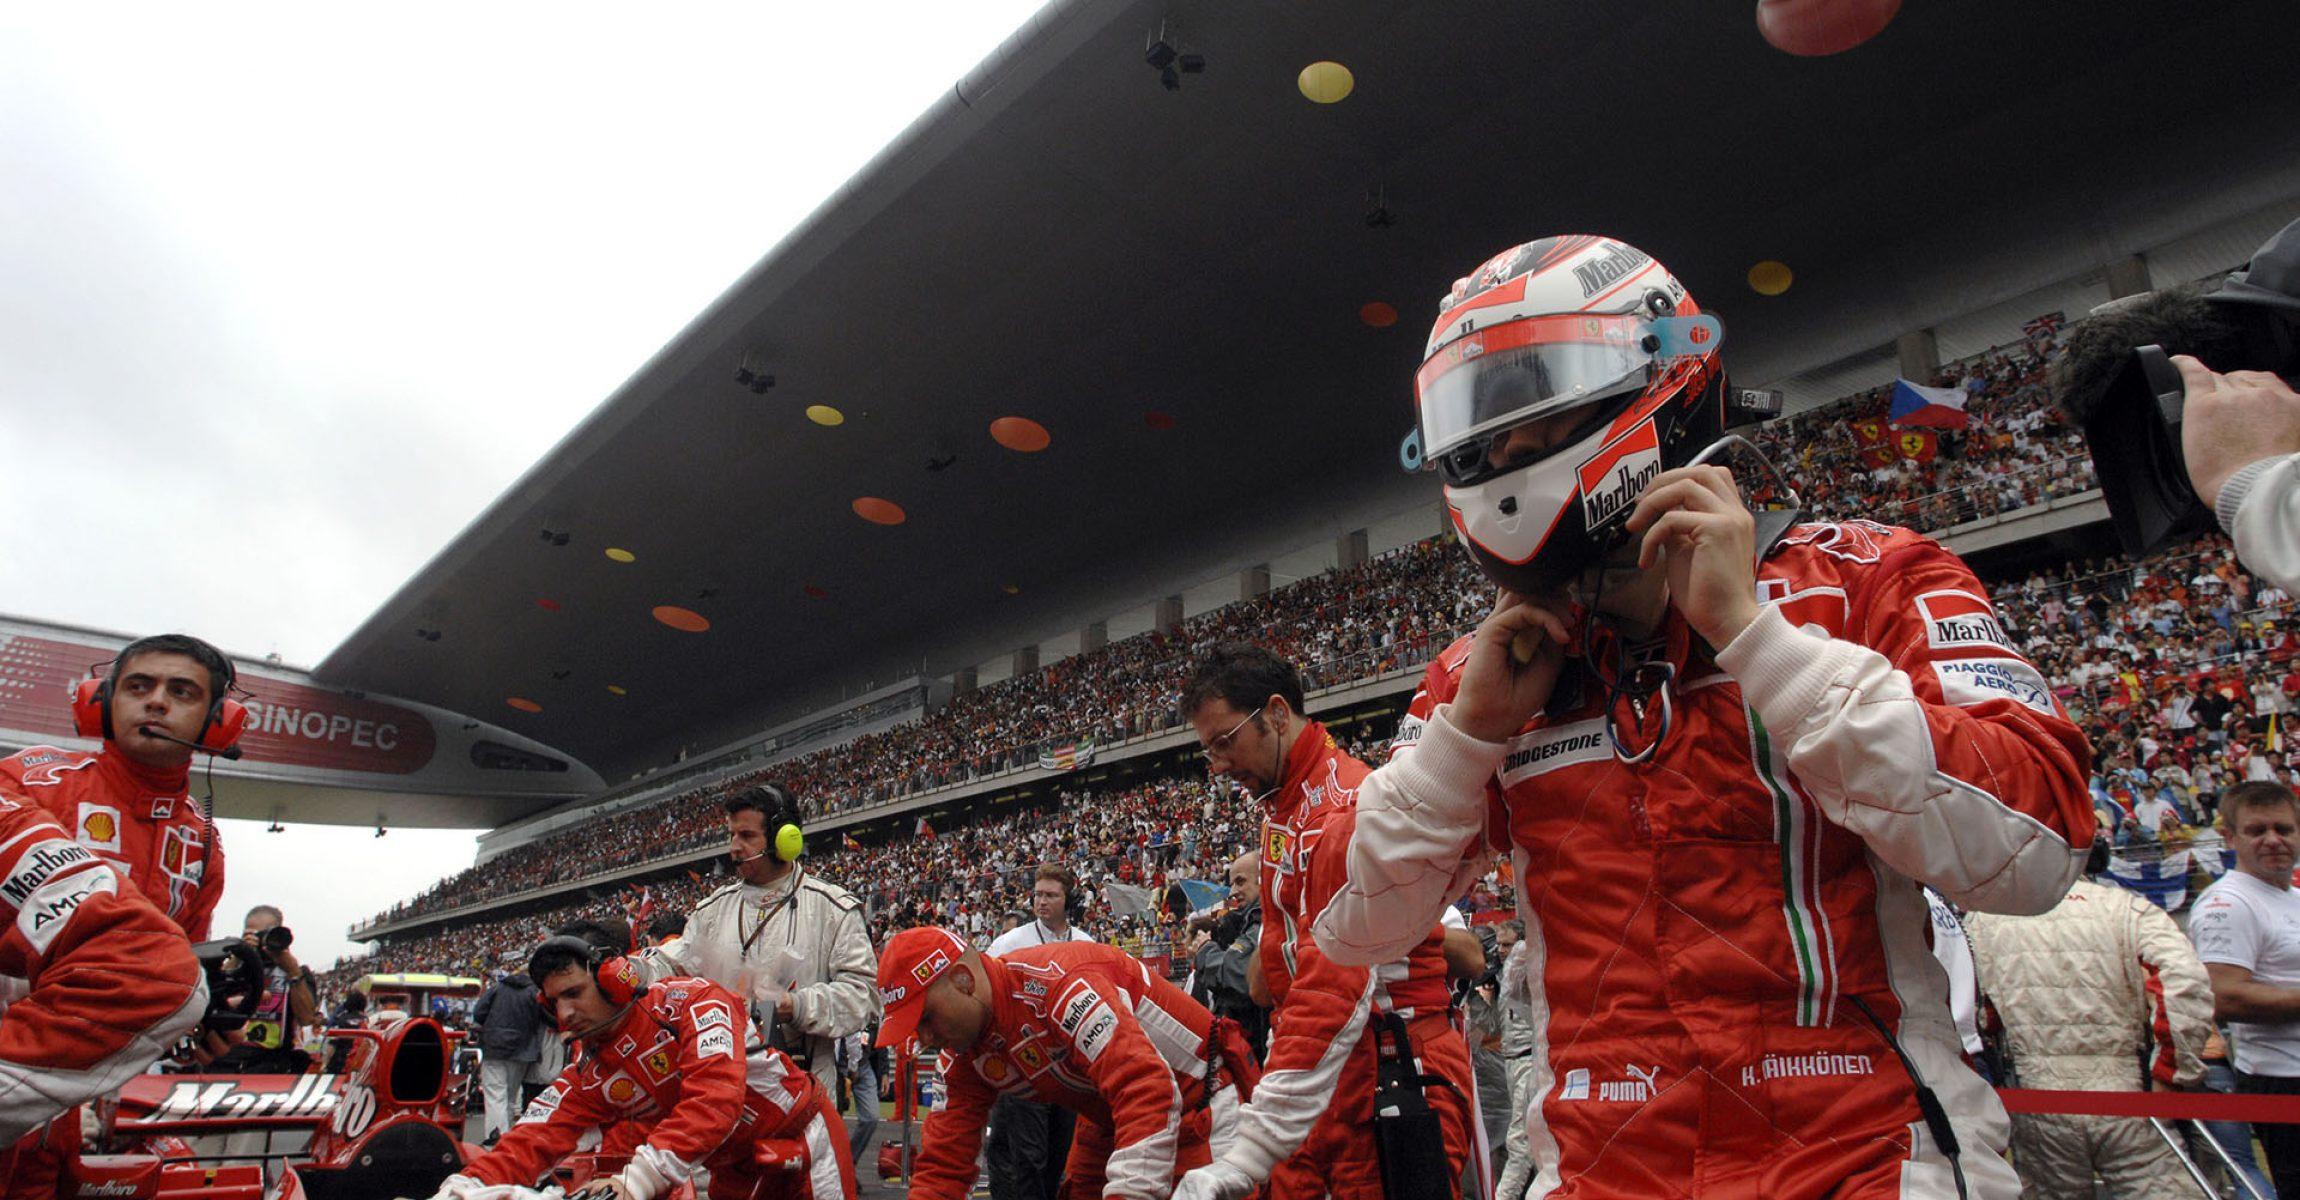 Kimi Räikkönen, Ferrari, 2007, Chinese Grand Prix, Shanghai